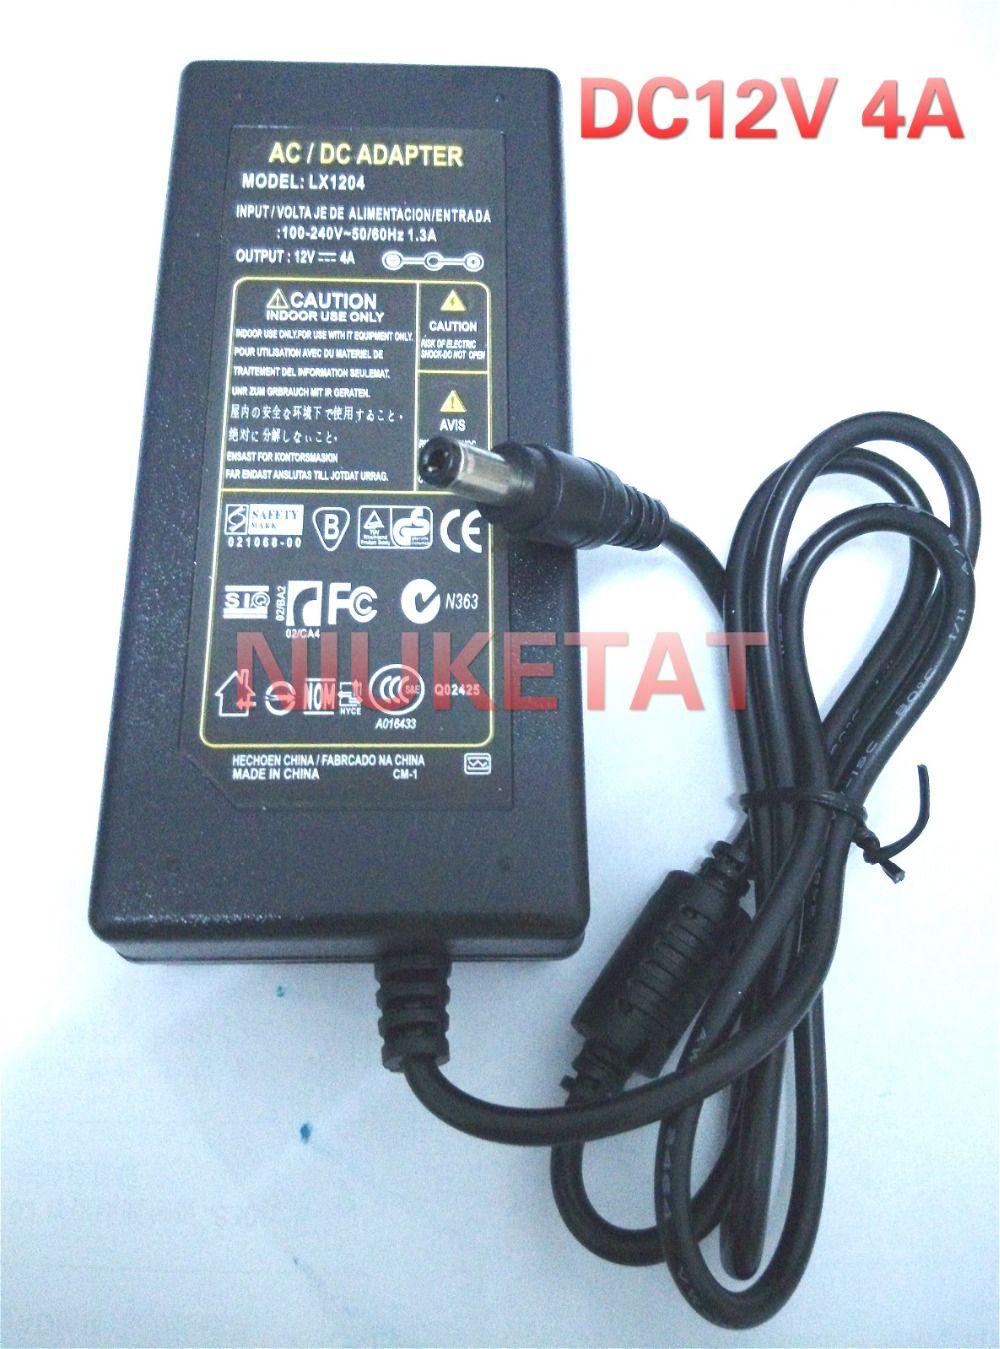 DC 12 V 4A AC 100-240 V 12V4A LED lumière puissance adaptateur LED Puissance fournir Adaptateur lecteur pour RGB LED bande 5050 3528 2835 Sans ligne